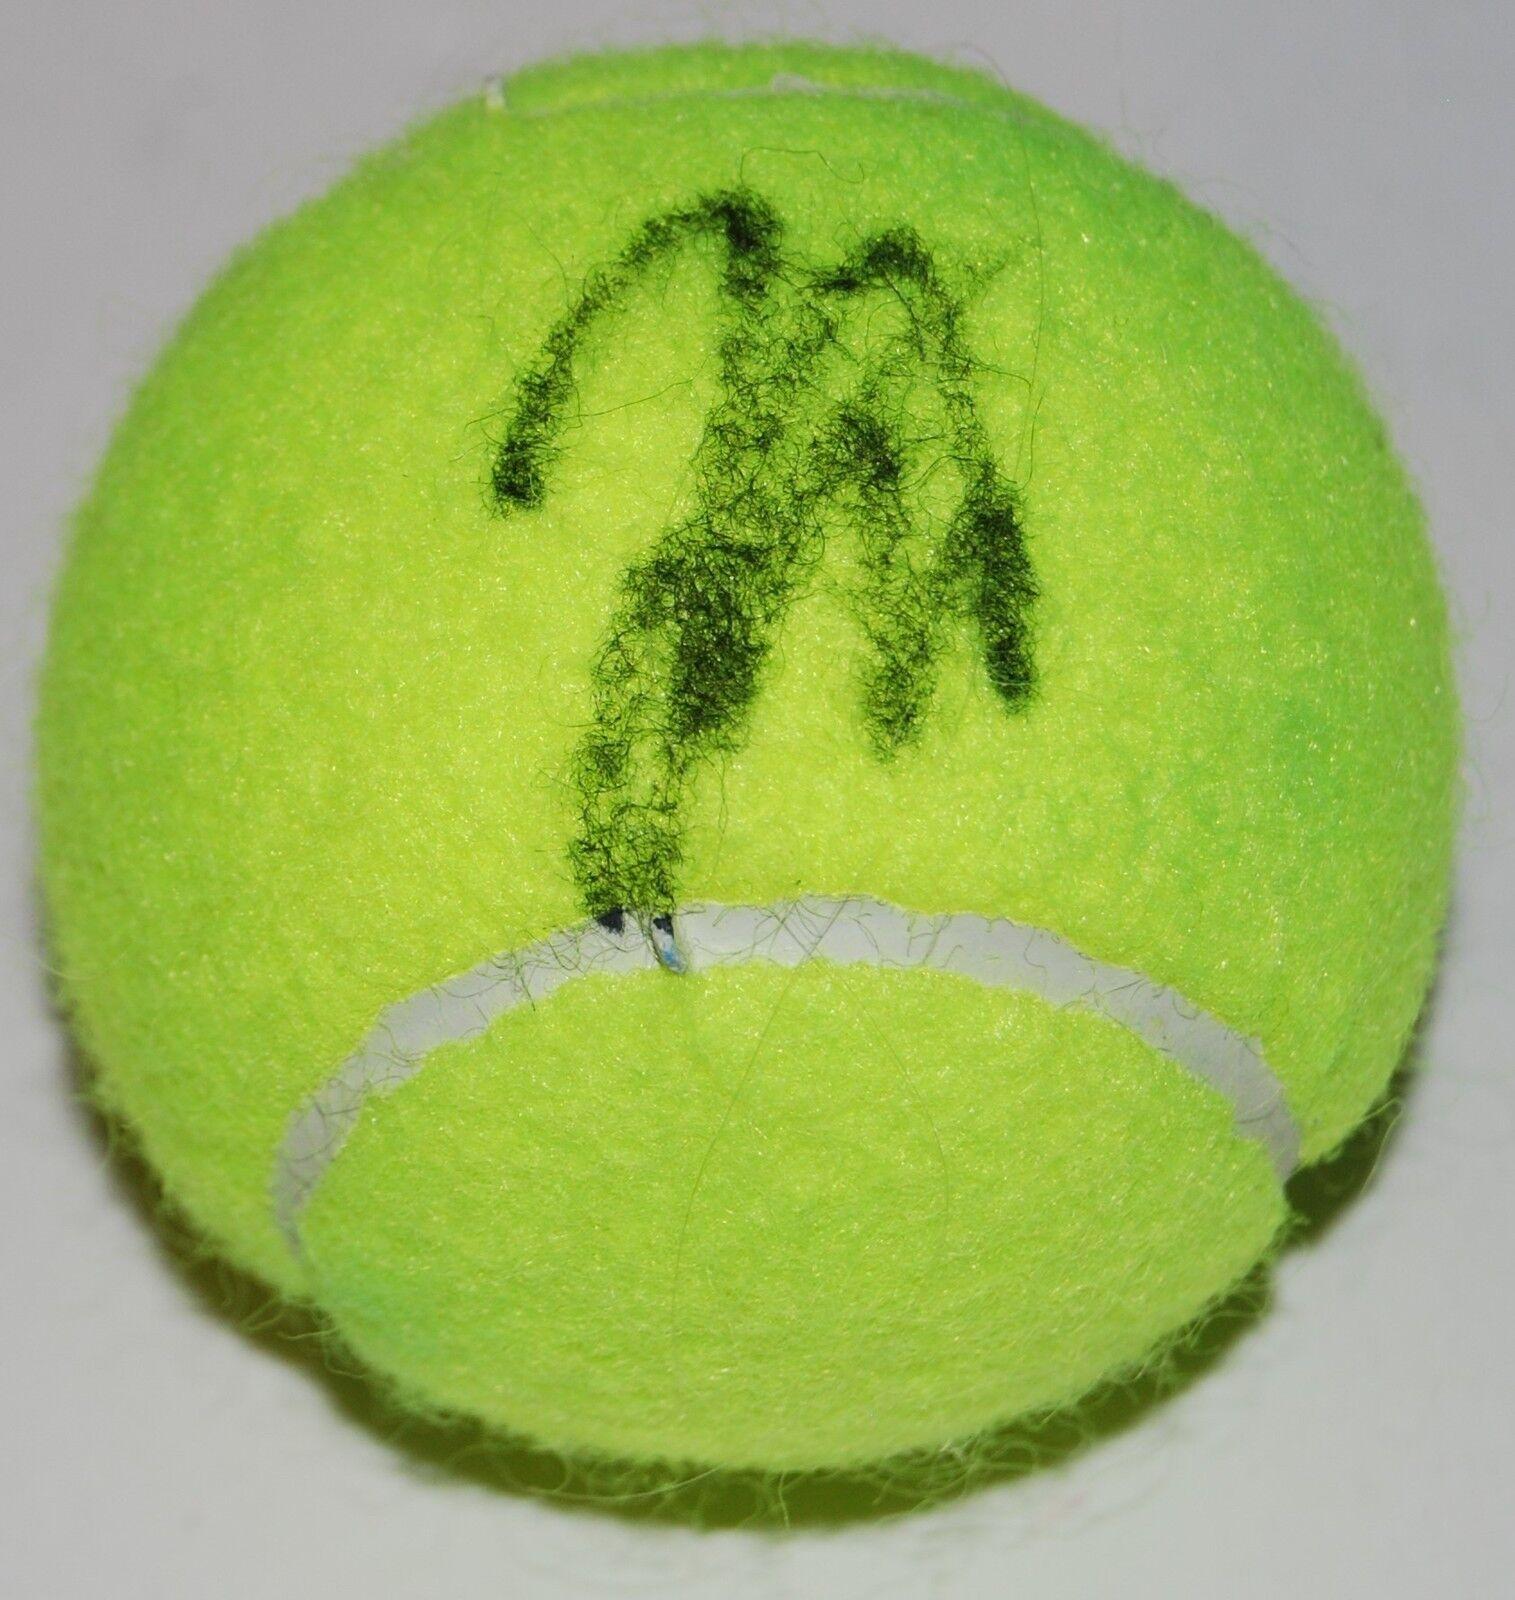 John Isner Firmado (Tenis) Bola Wimbledon Lavar Lavar Lavar Copa Autografiado con   Coa  el mas reciente